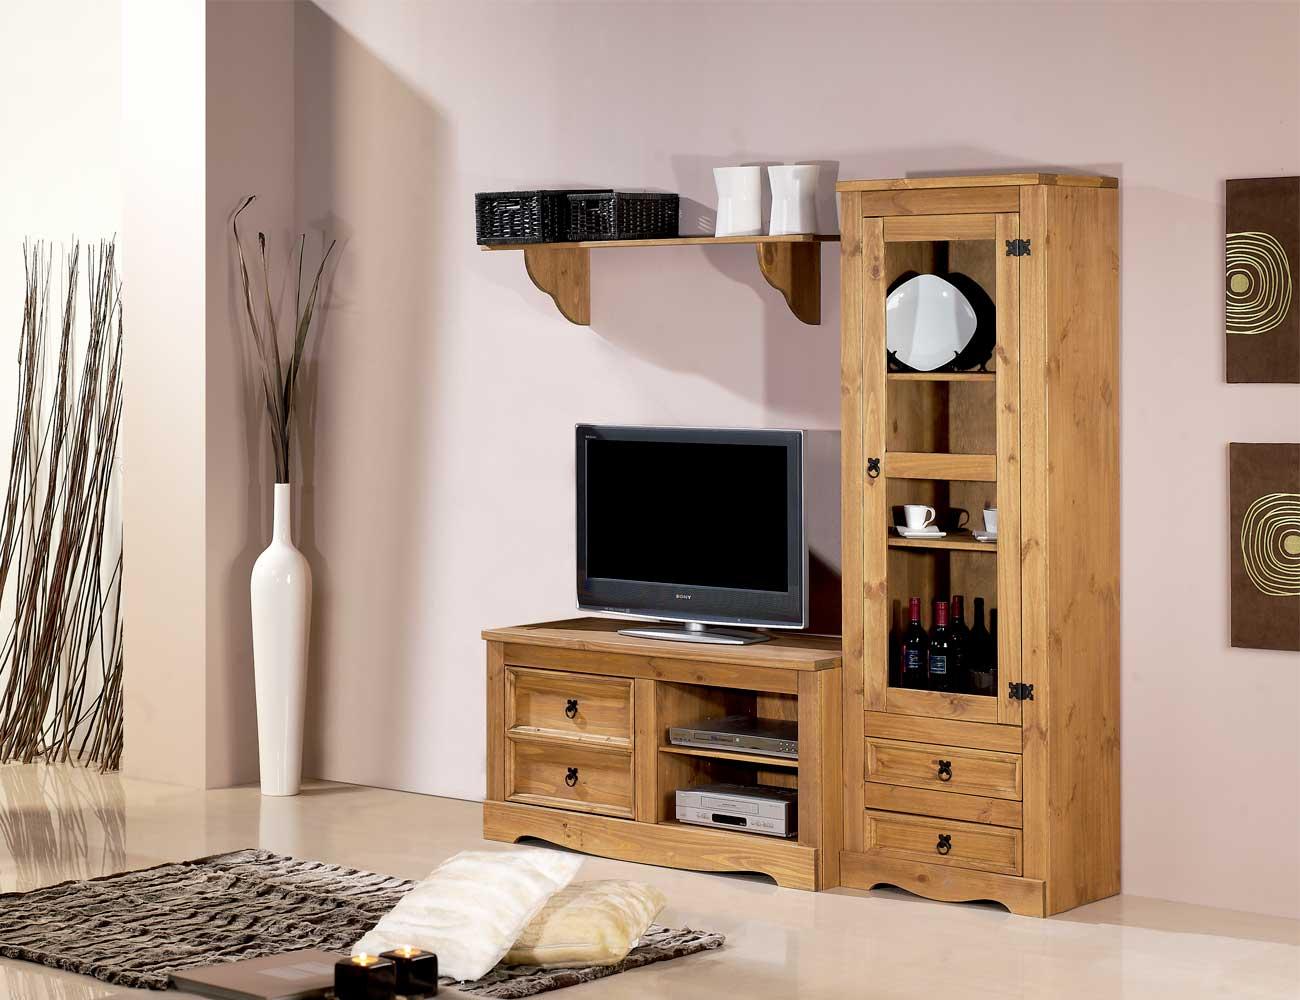 Mueble salon comedor madera rustico nogal claro vitrina cristal 175 cm